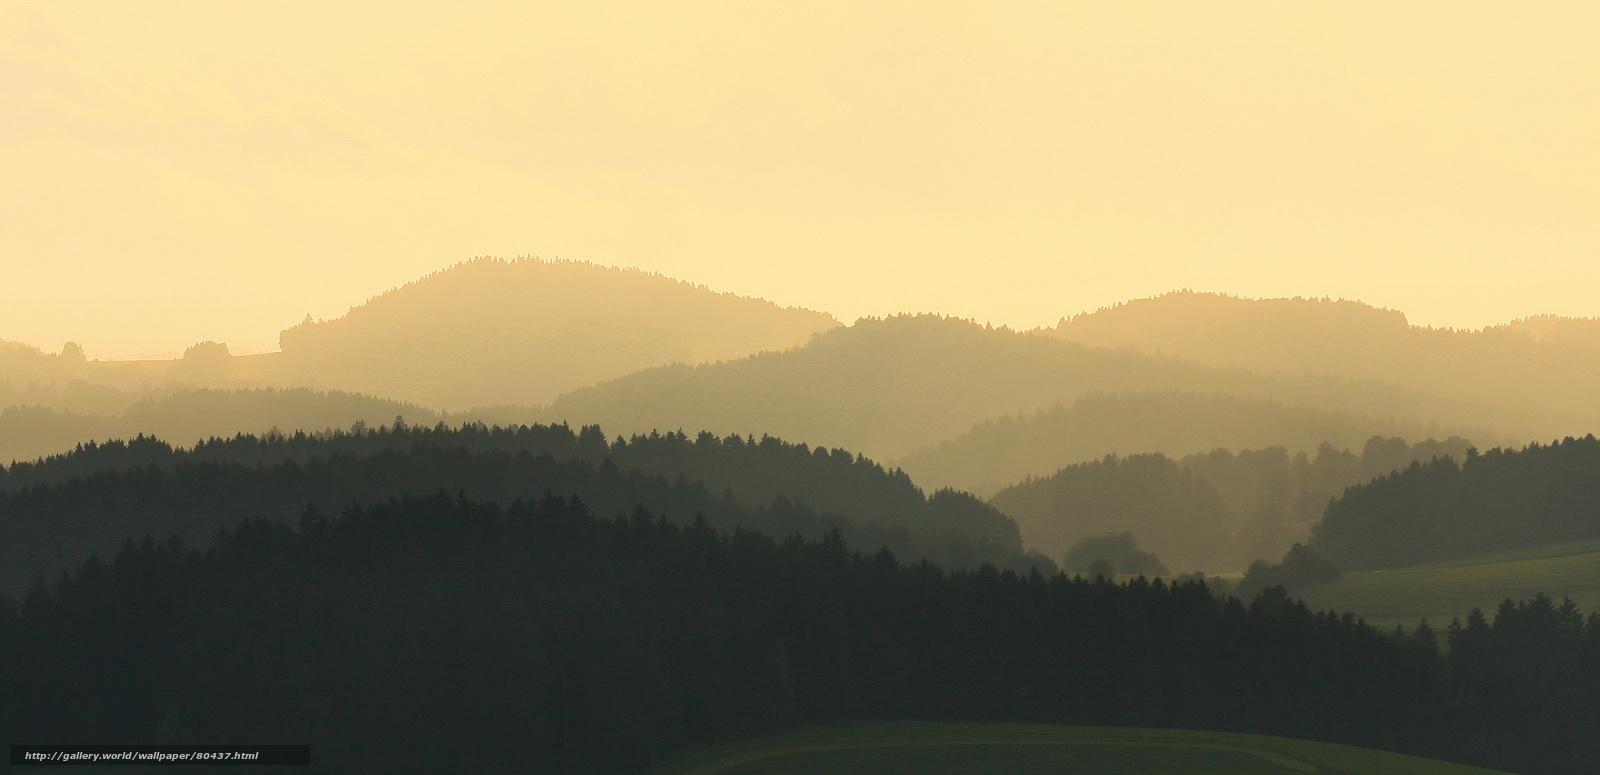 Wallpaper download free - Download Wallpaper Landscapes Wallpaper Photo View Free